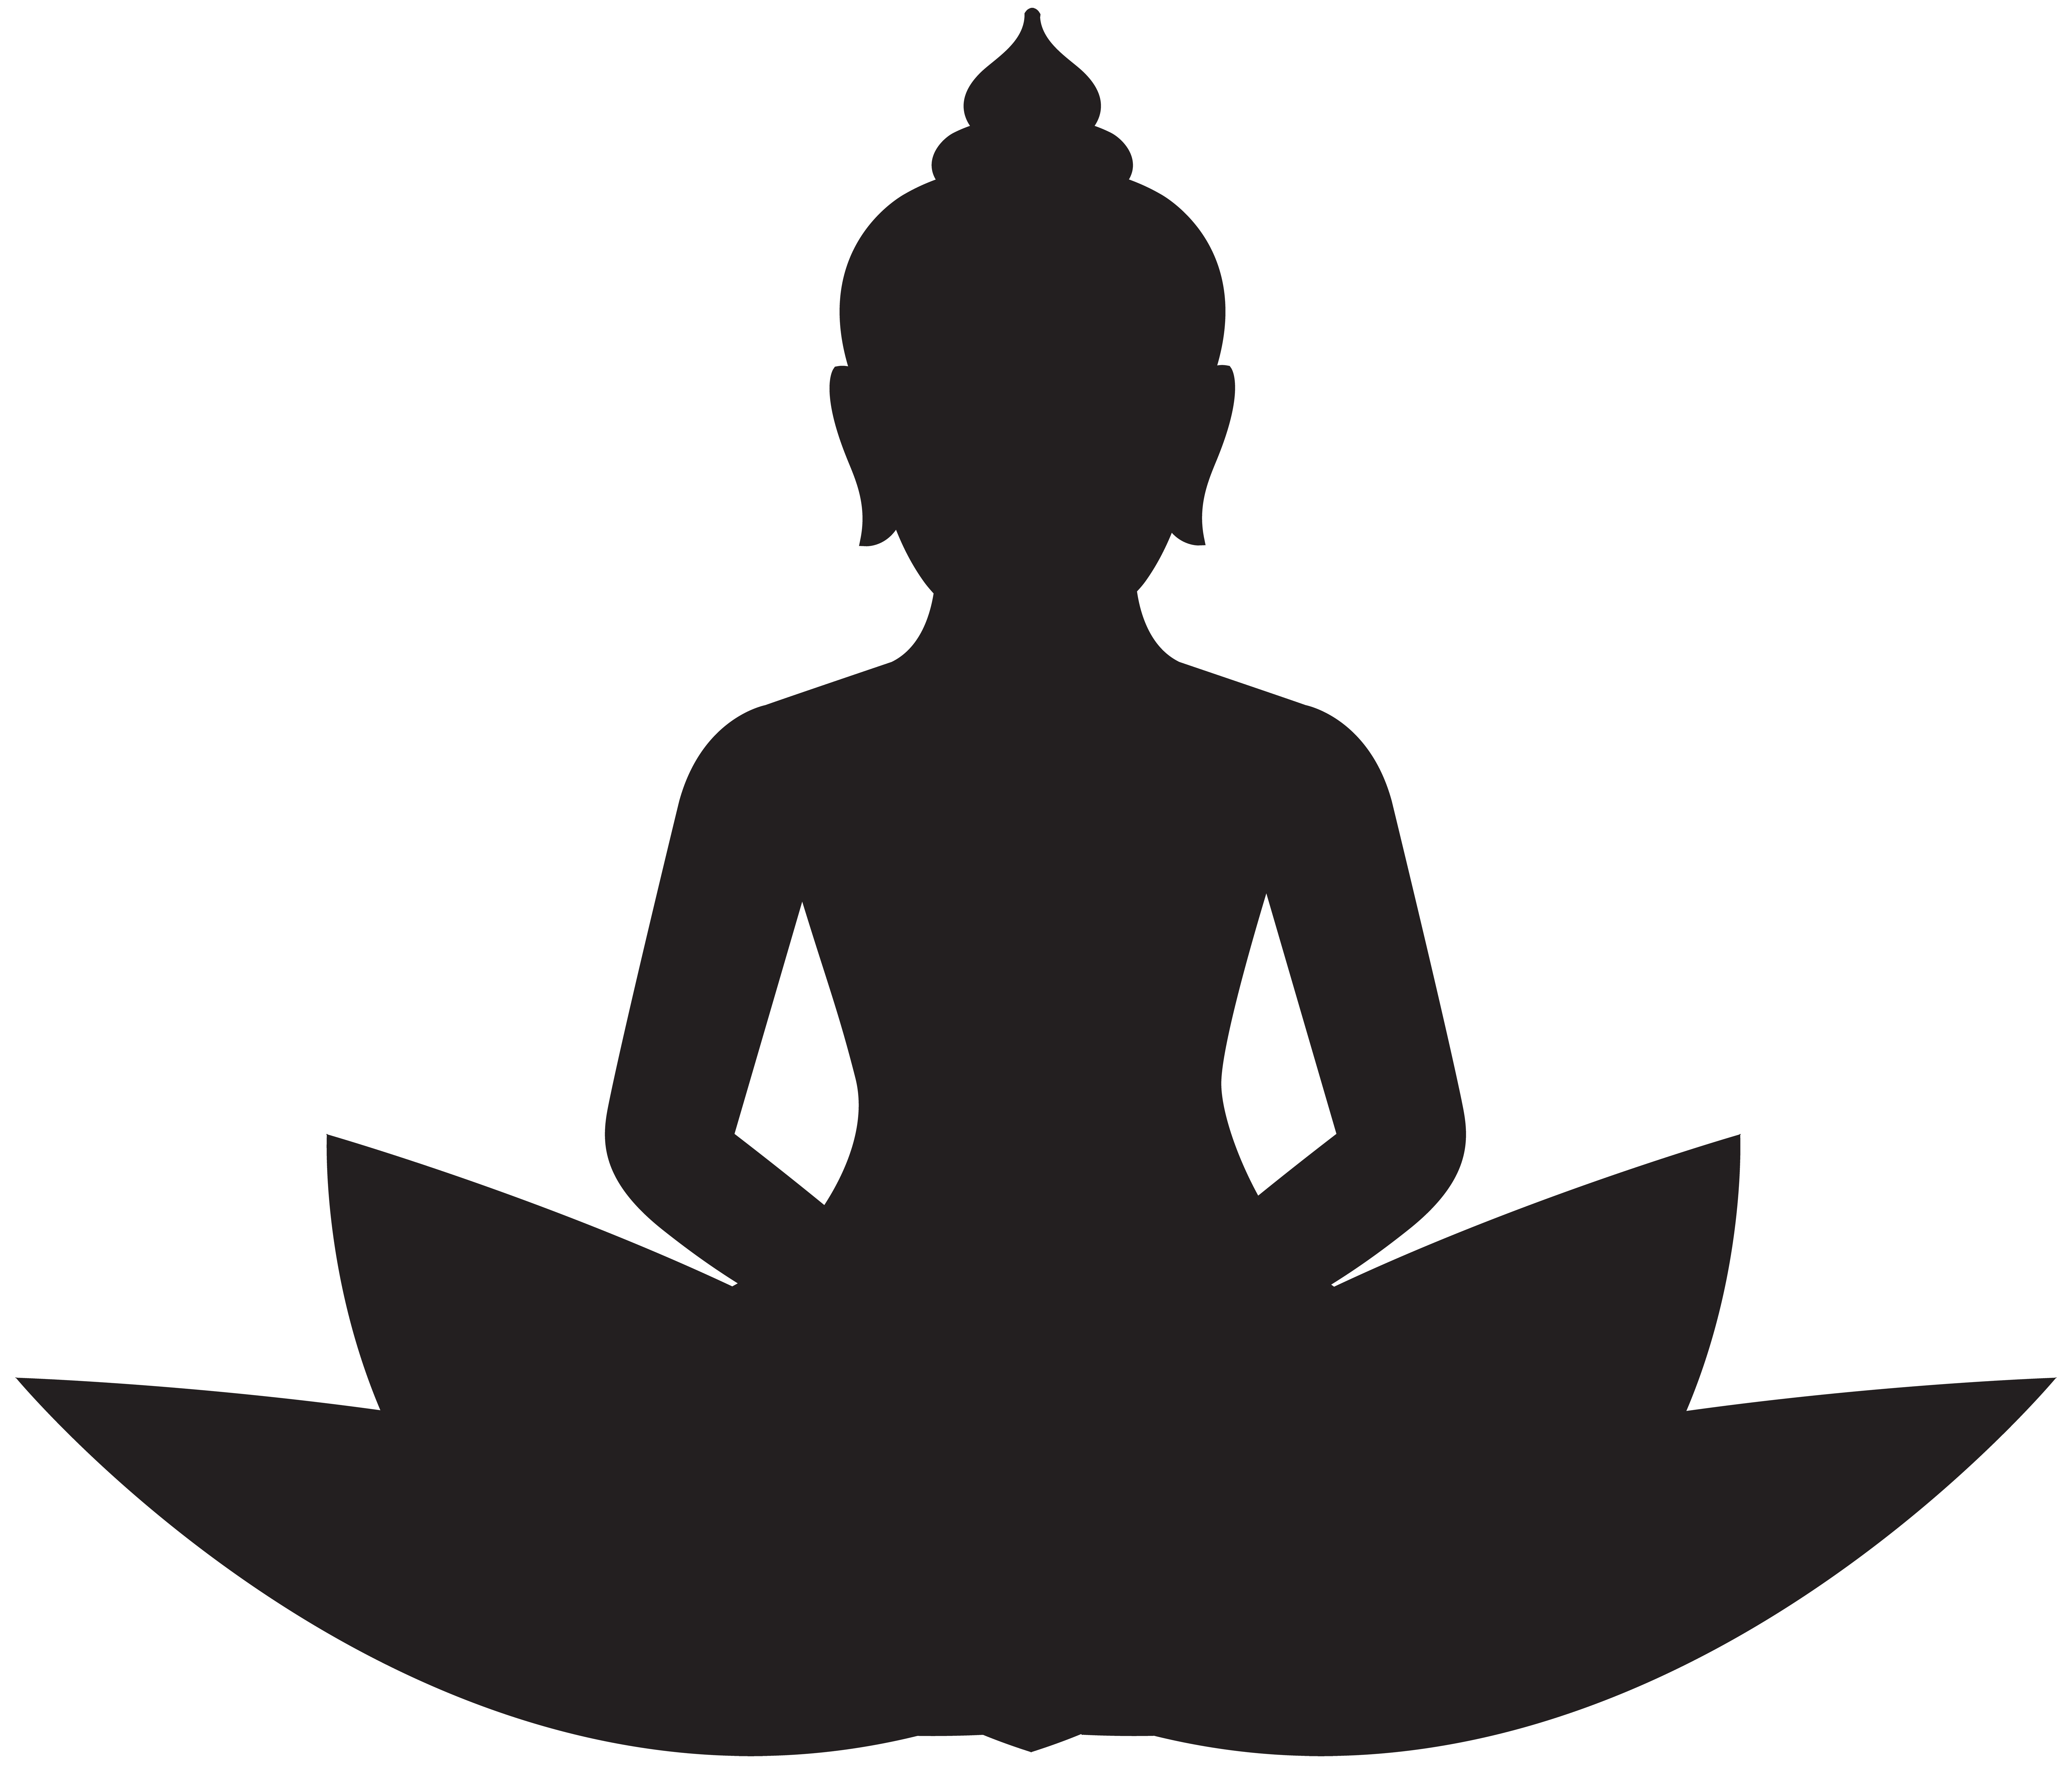 Meditation clipart buddhism symbol, Meditation buddhism ...